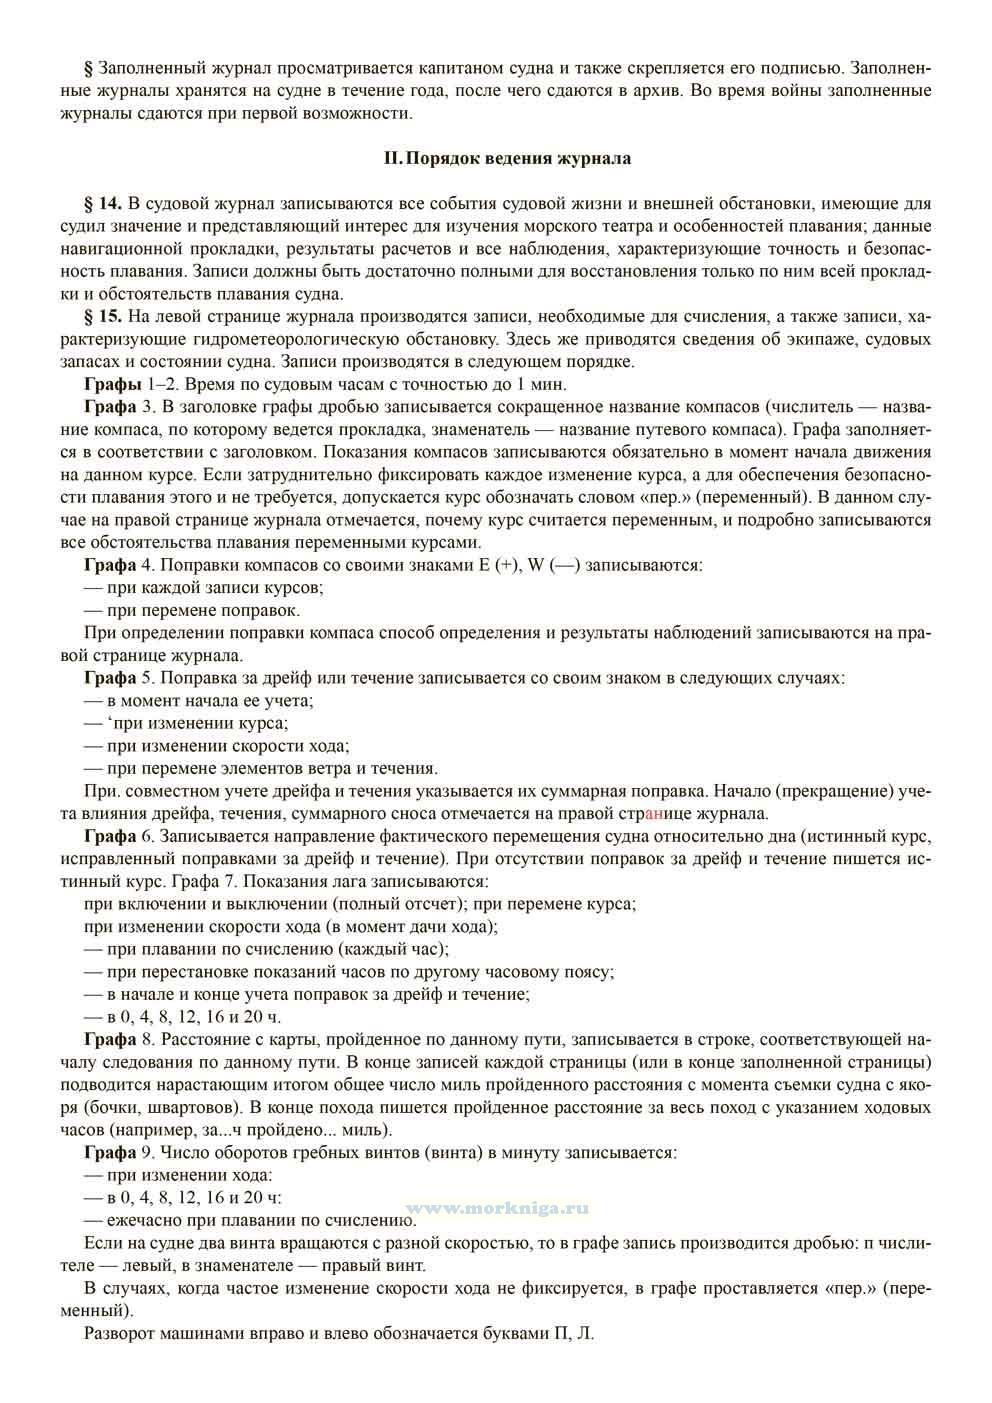 Судовой журнал. Форма Ш-5